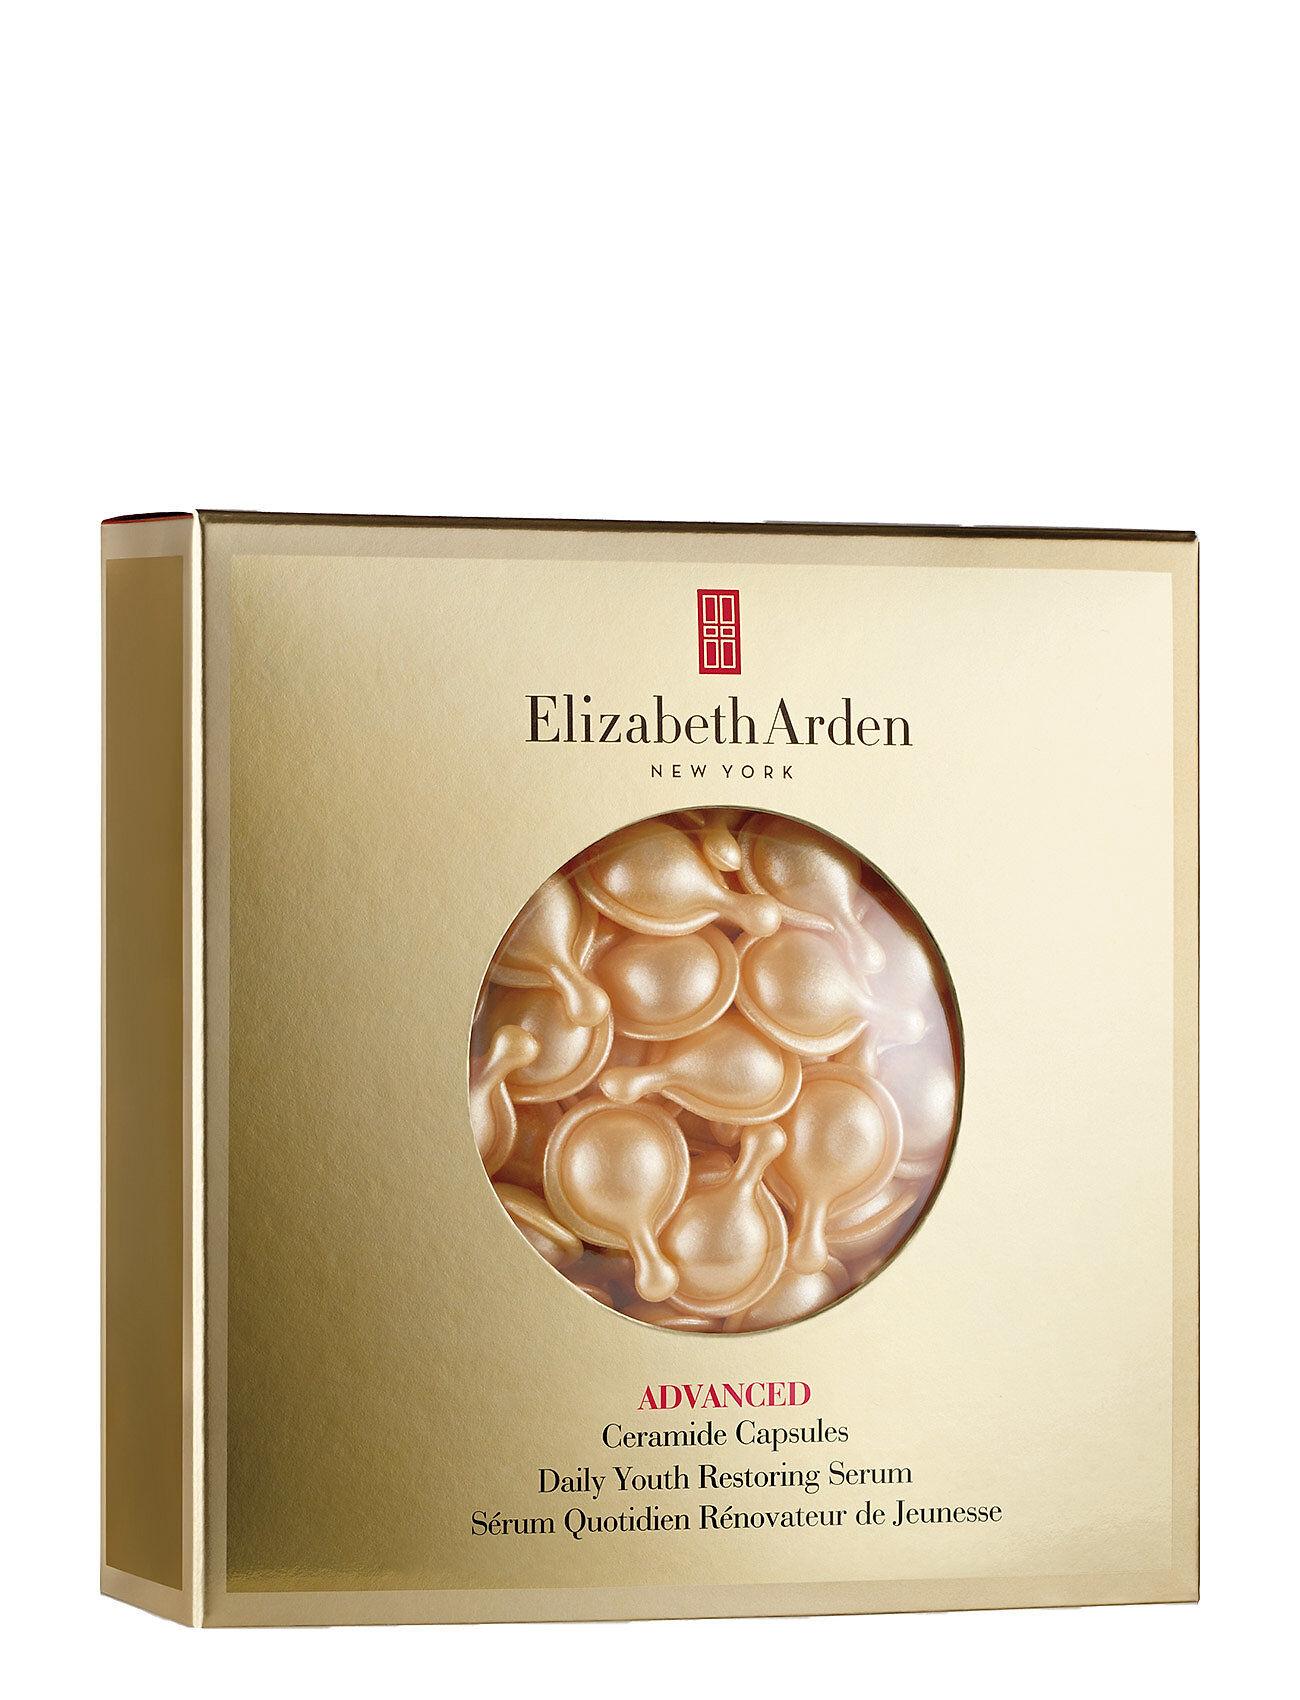 Elizabeth Arden Ceramide Capsules Restoring Serum Refill 45pcs Seerumi Kasvot Ihonhoito Nude Elizabeth Arden